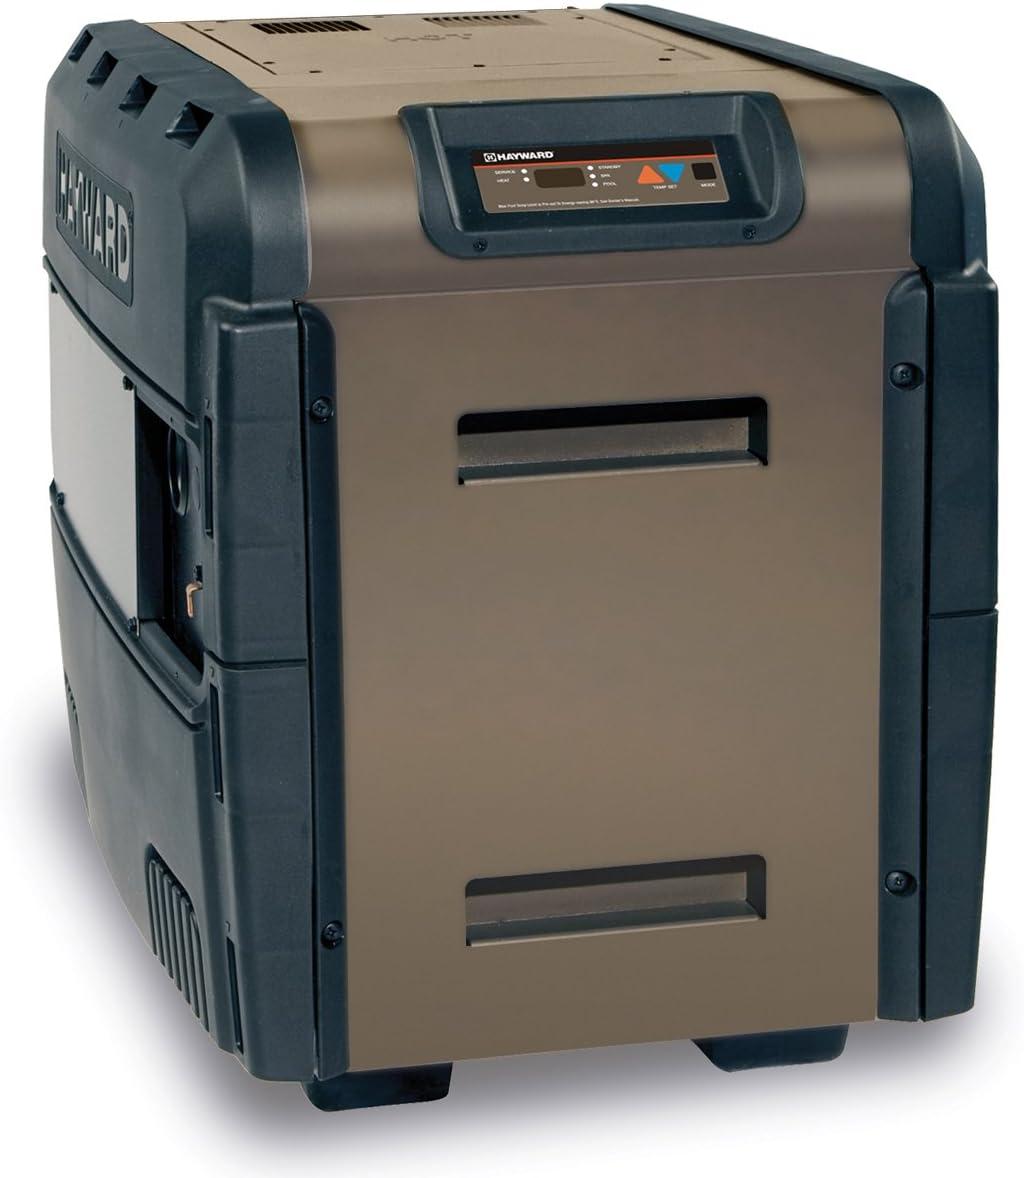 Hayward H150FDN Universal H-Series 150,000 BTU Pool and Spa Heater, Natural Gas, Low Nox